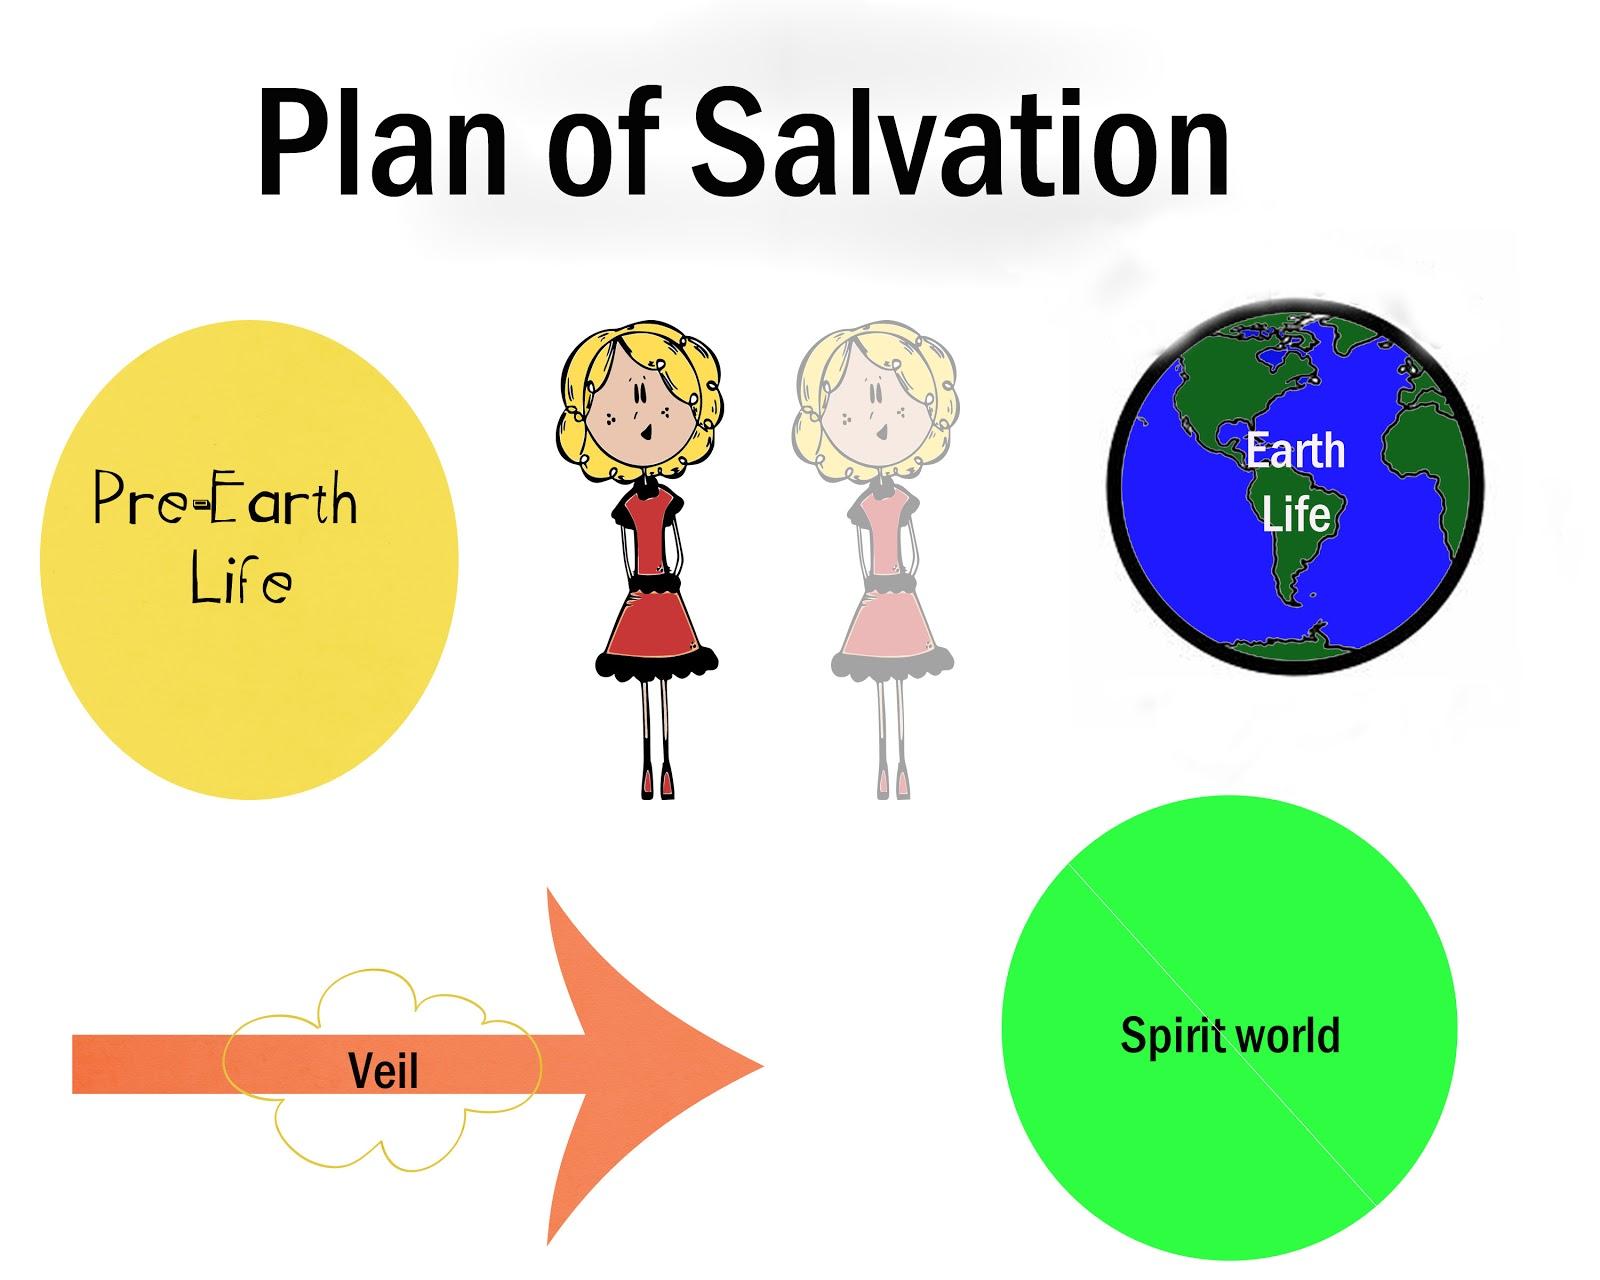 image regarding Plan of Salvation Printable named Krysp Images: System of Salvation (absolutely free printable)